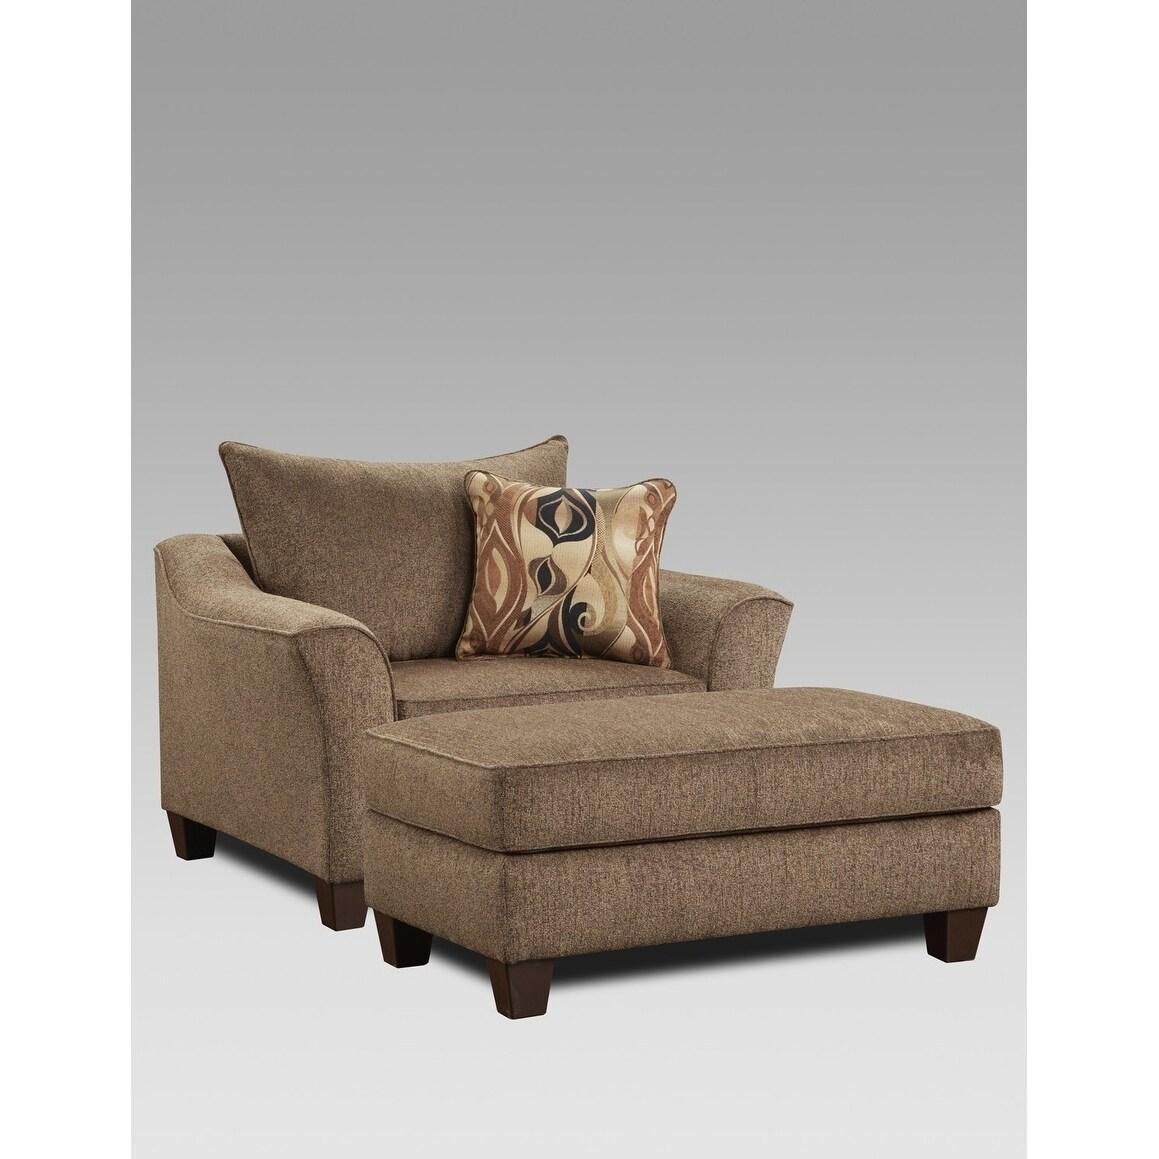 Awe Inspiring Sofa Trendz Cole Cafe Brown Chair 1 2 Ottoman 2 Pc Set Pabps2019 Chair Design Images Pabps2019Com